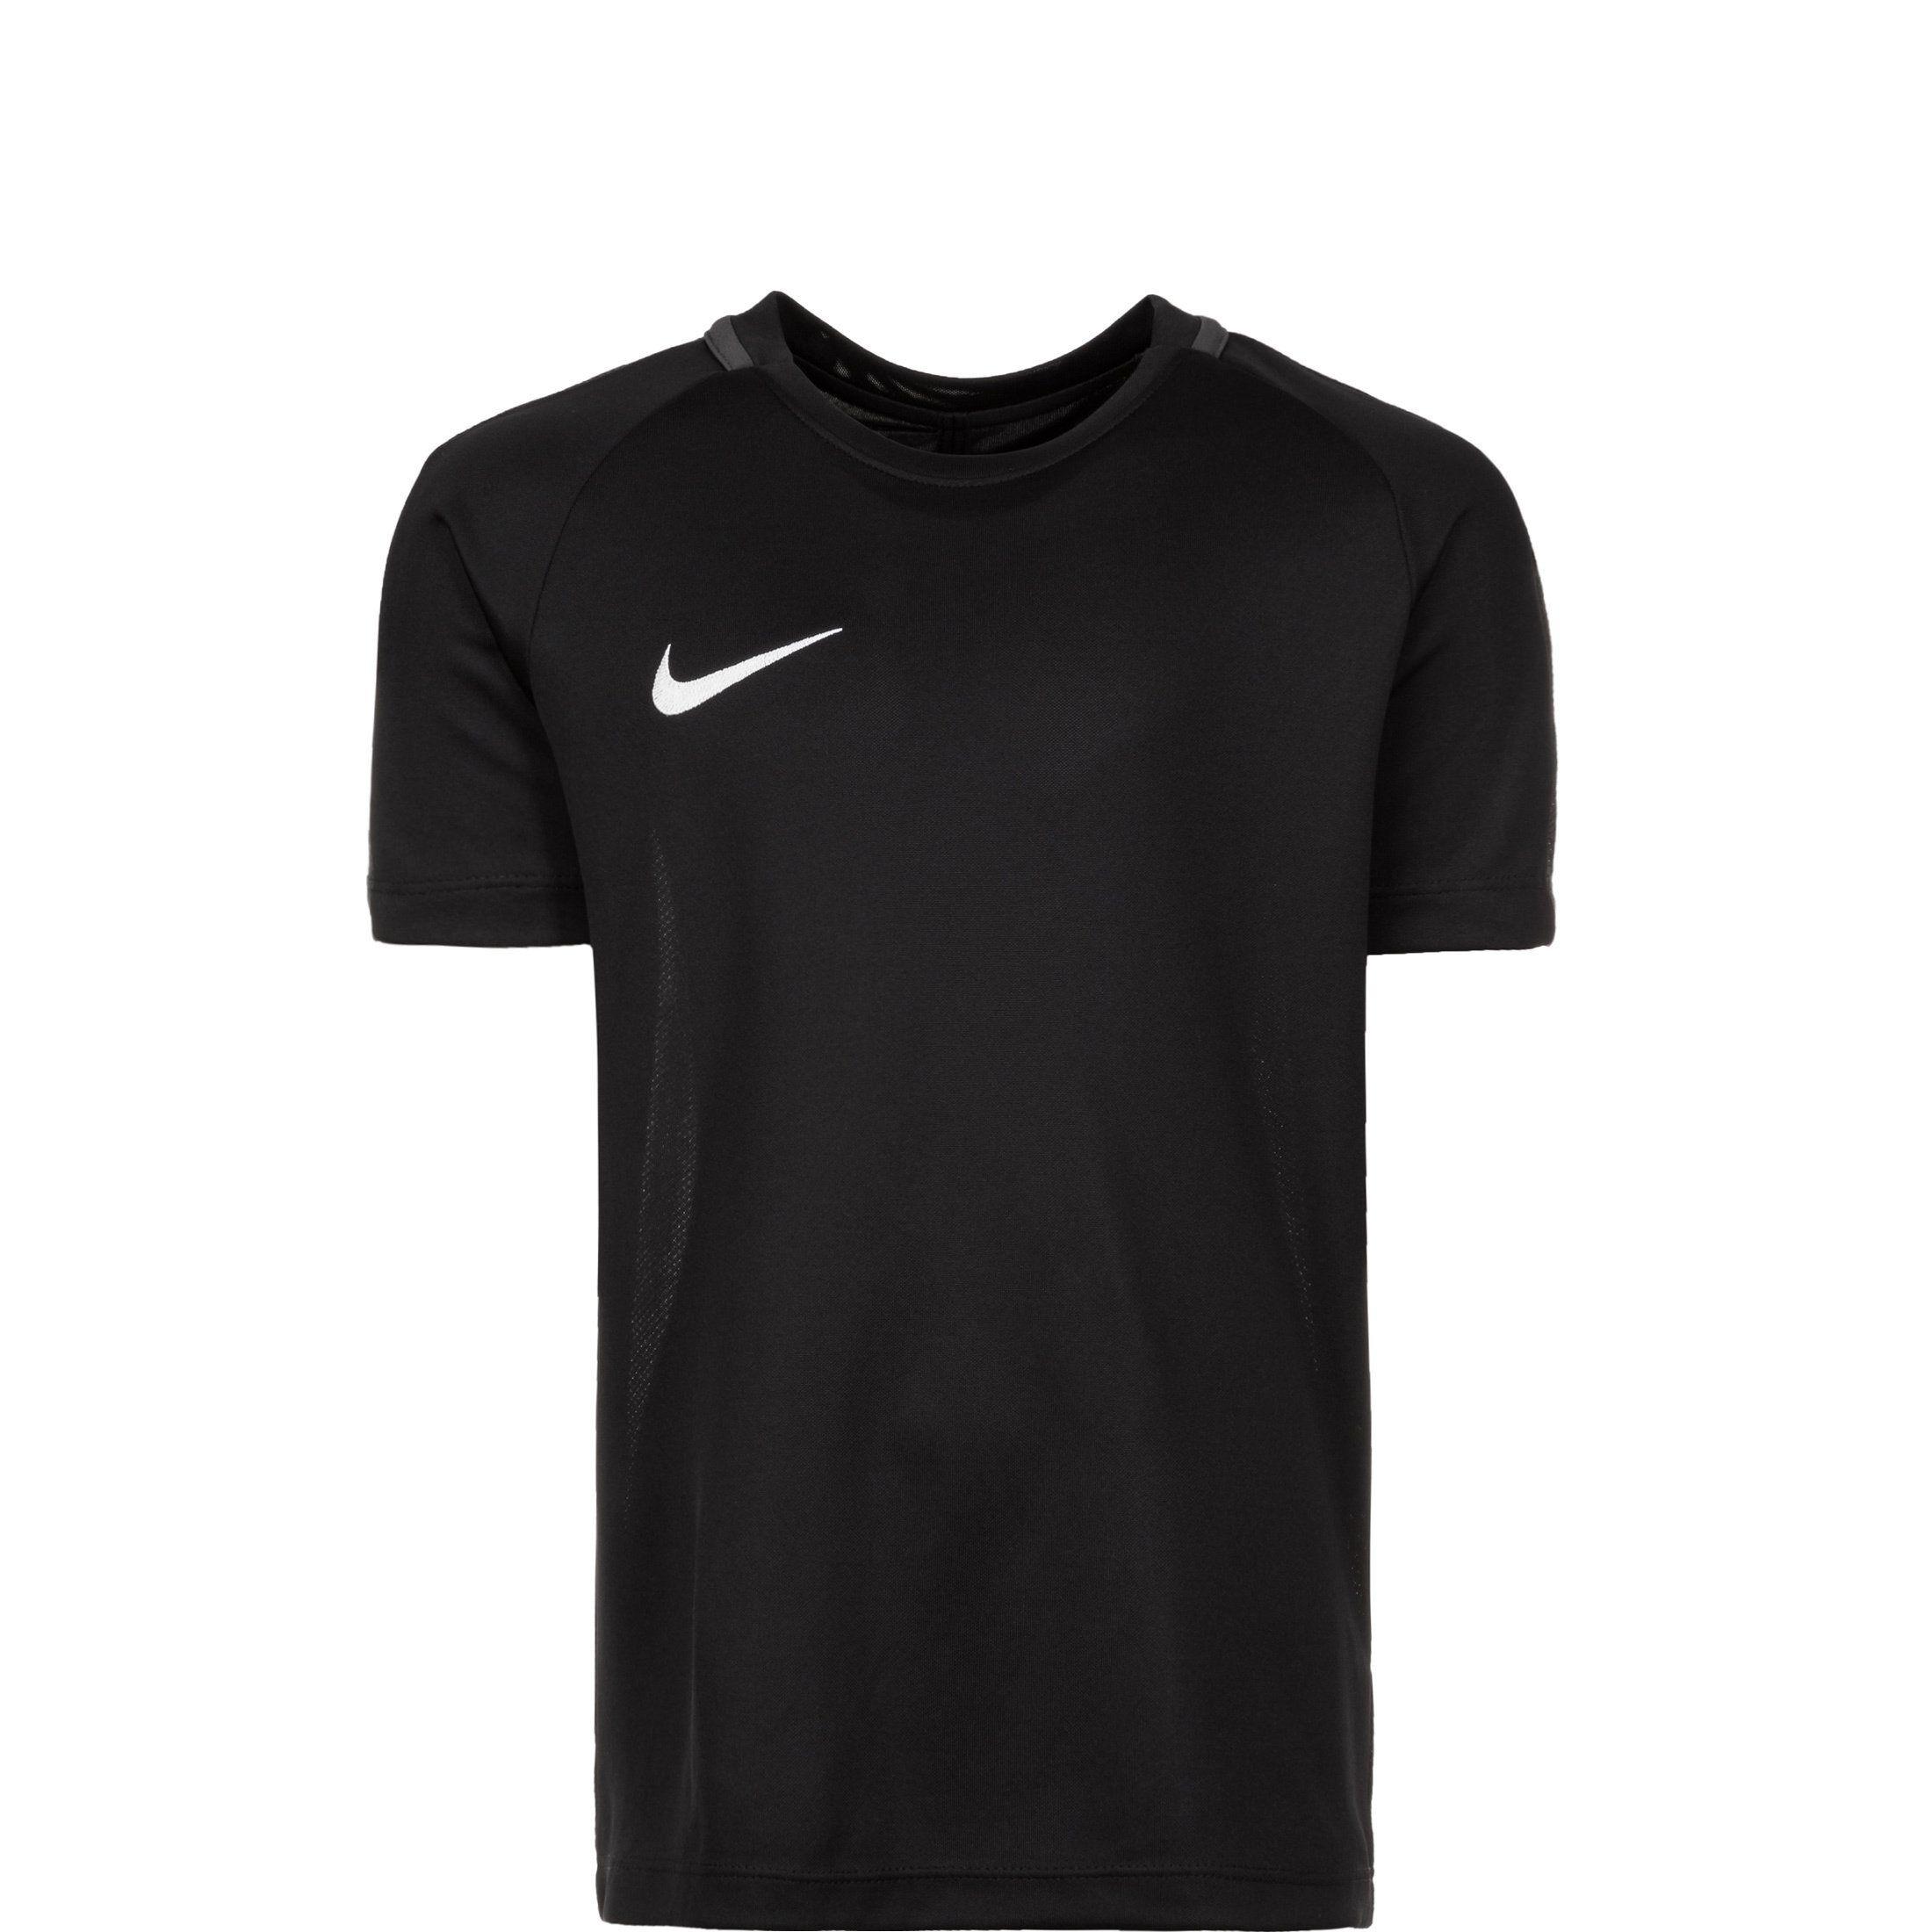 Nike Trainingsshirt »Dry Academy 18«, schwarz